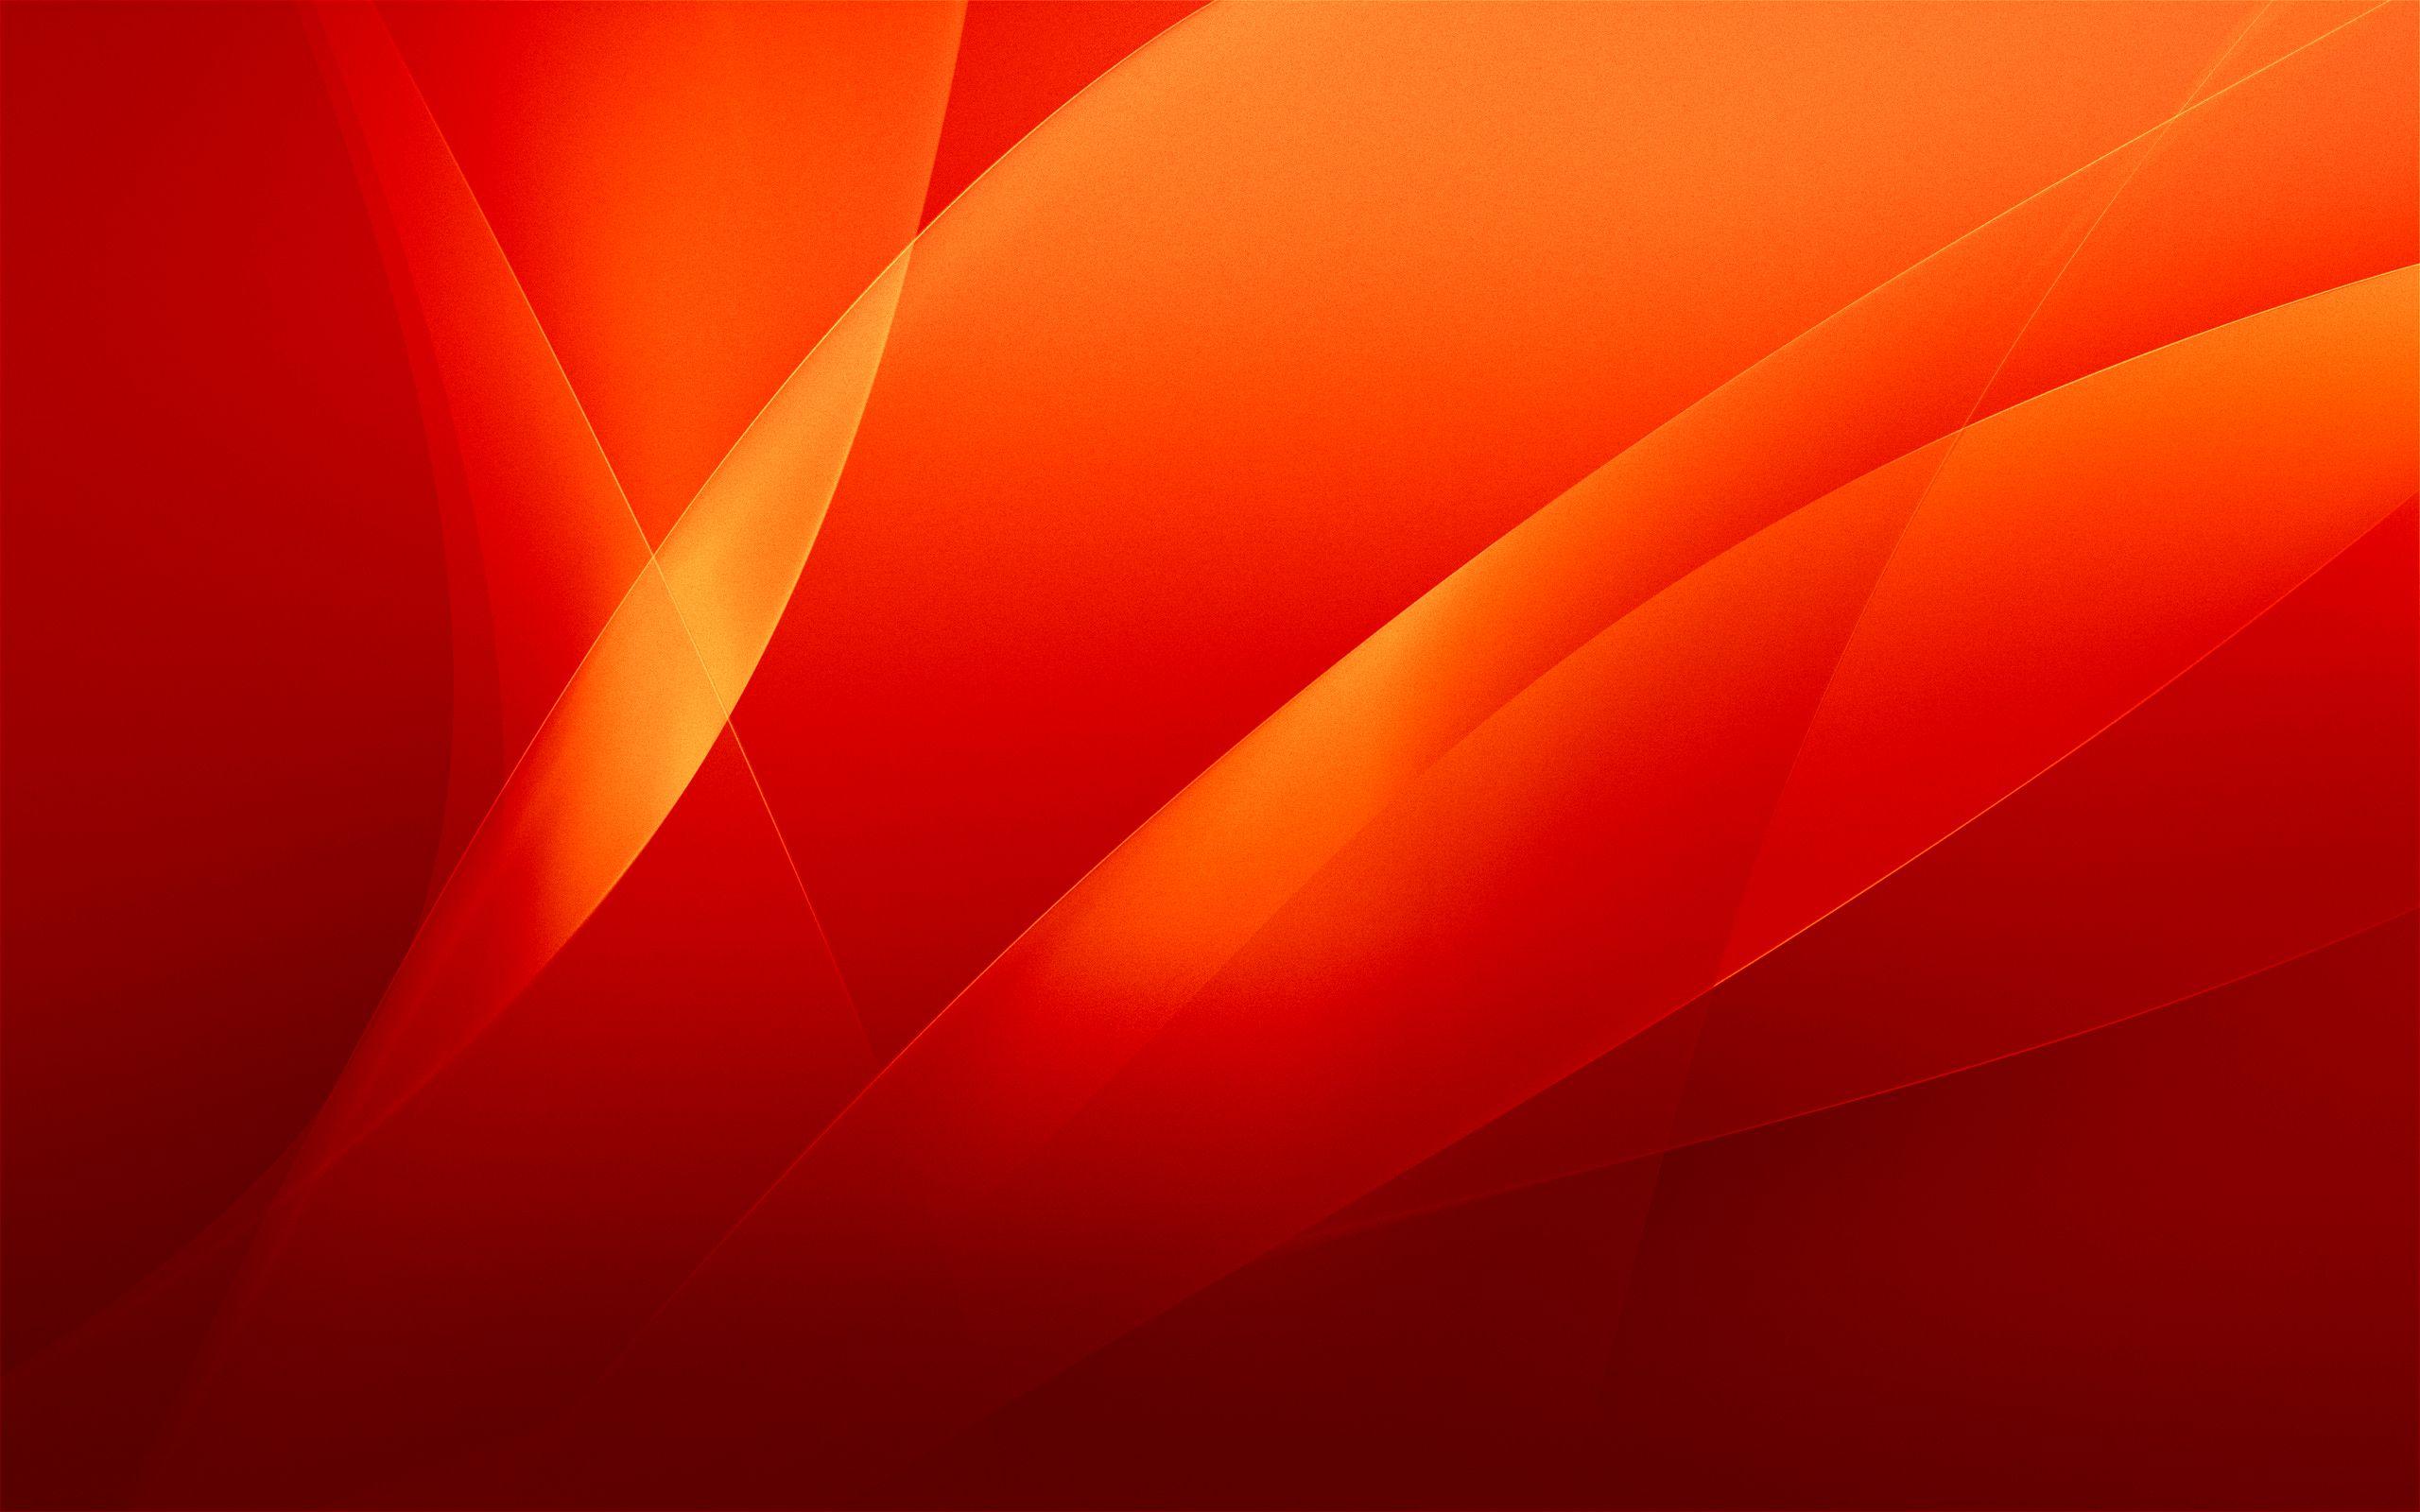 Red Background High Resolution Wallpaper  Orange in 2019